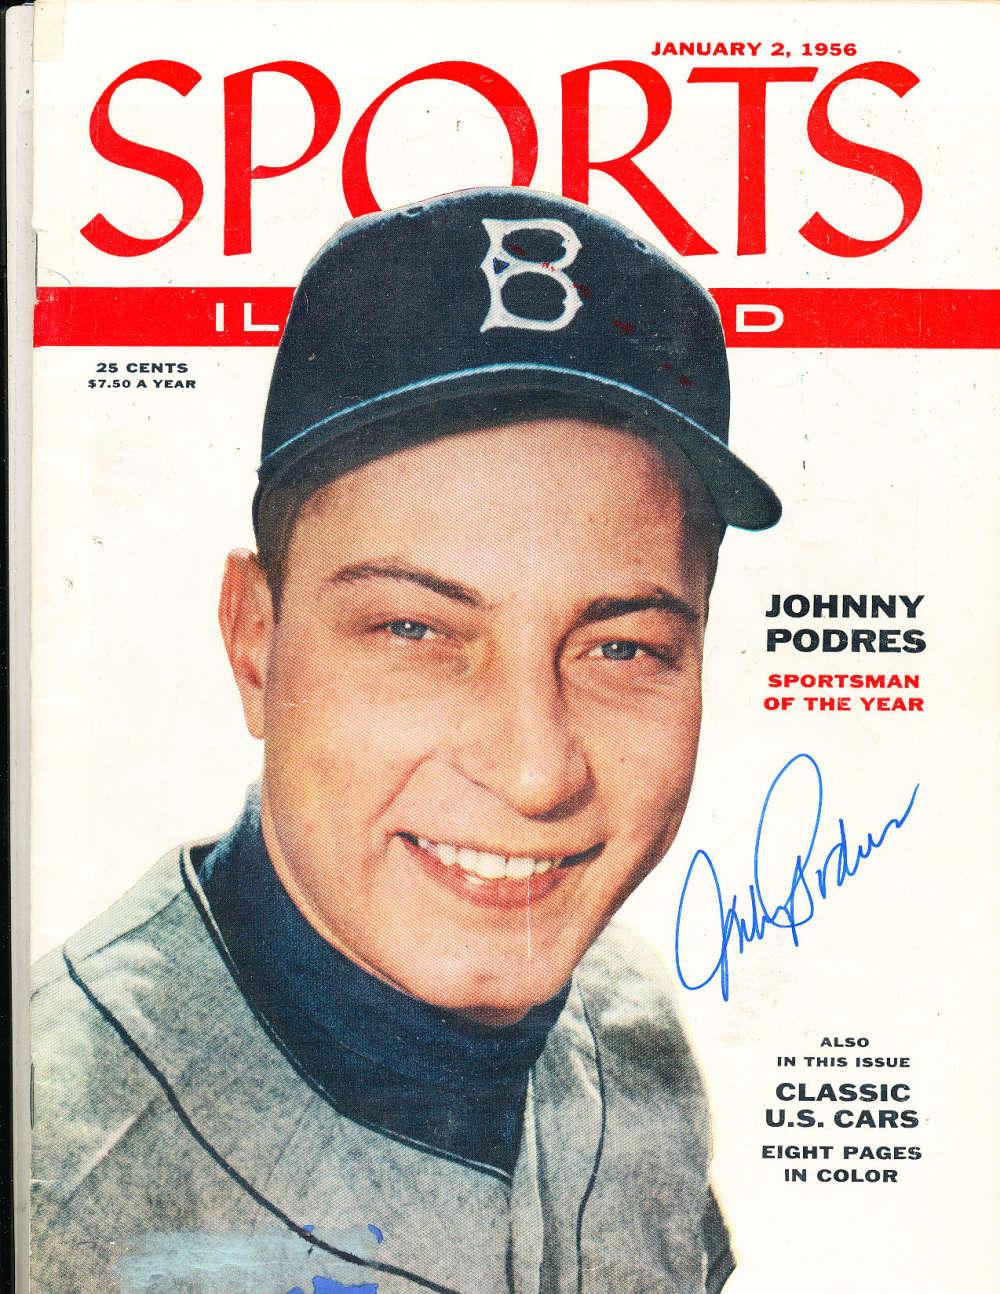 1/4 1956 Johnny Podres Sports Illustrated SIGNED Sportsman a29